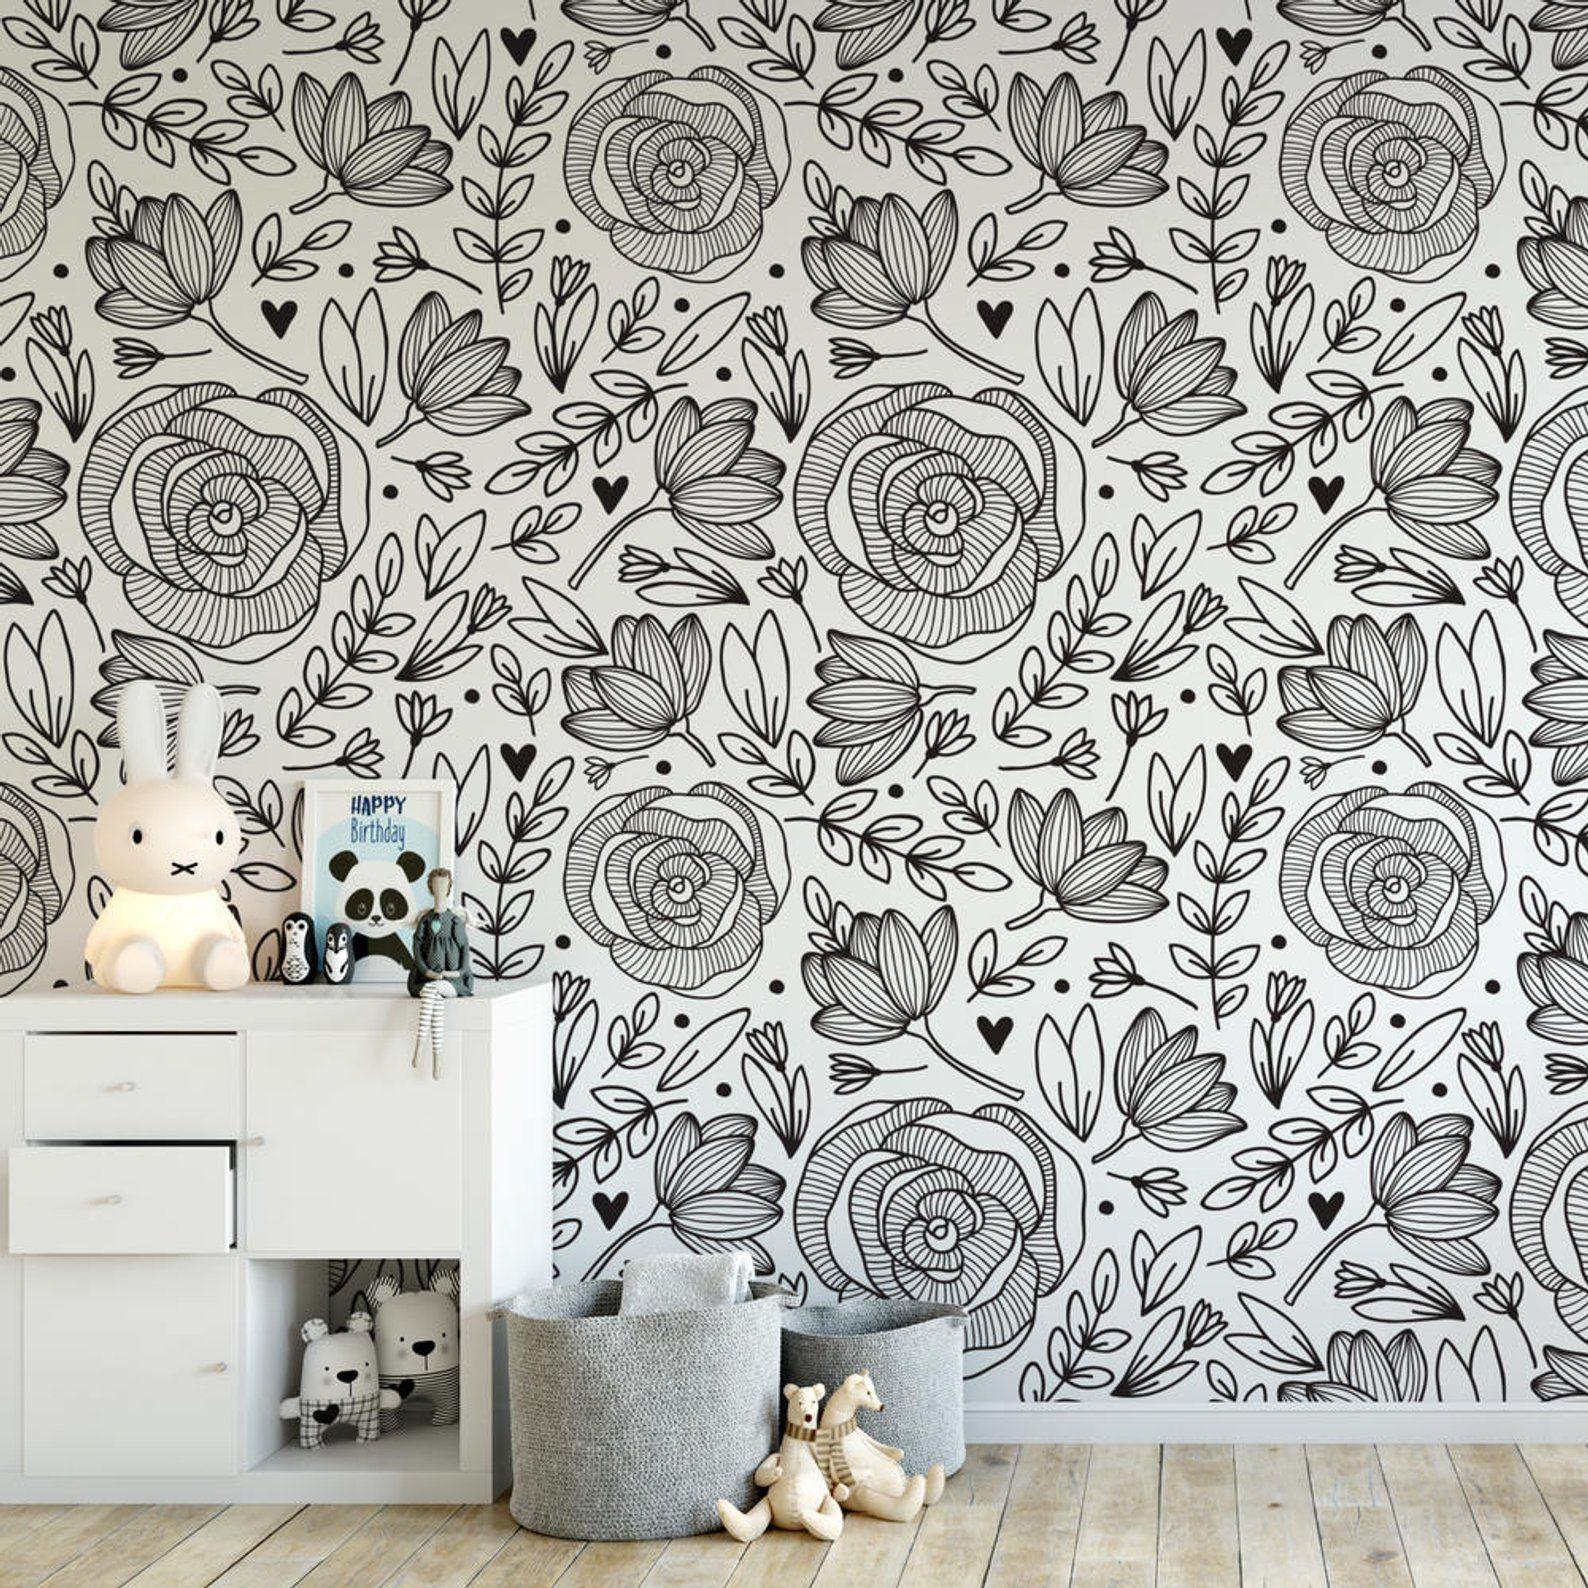 Black And White Floral Wallpaper B132 27 Etsy Black And White Wallpaper Removable Wallpaper Peony Wallpaper